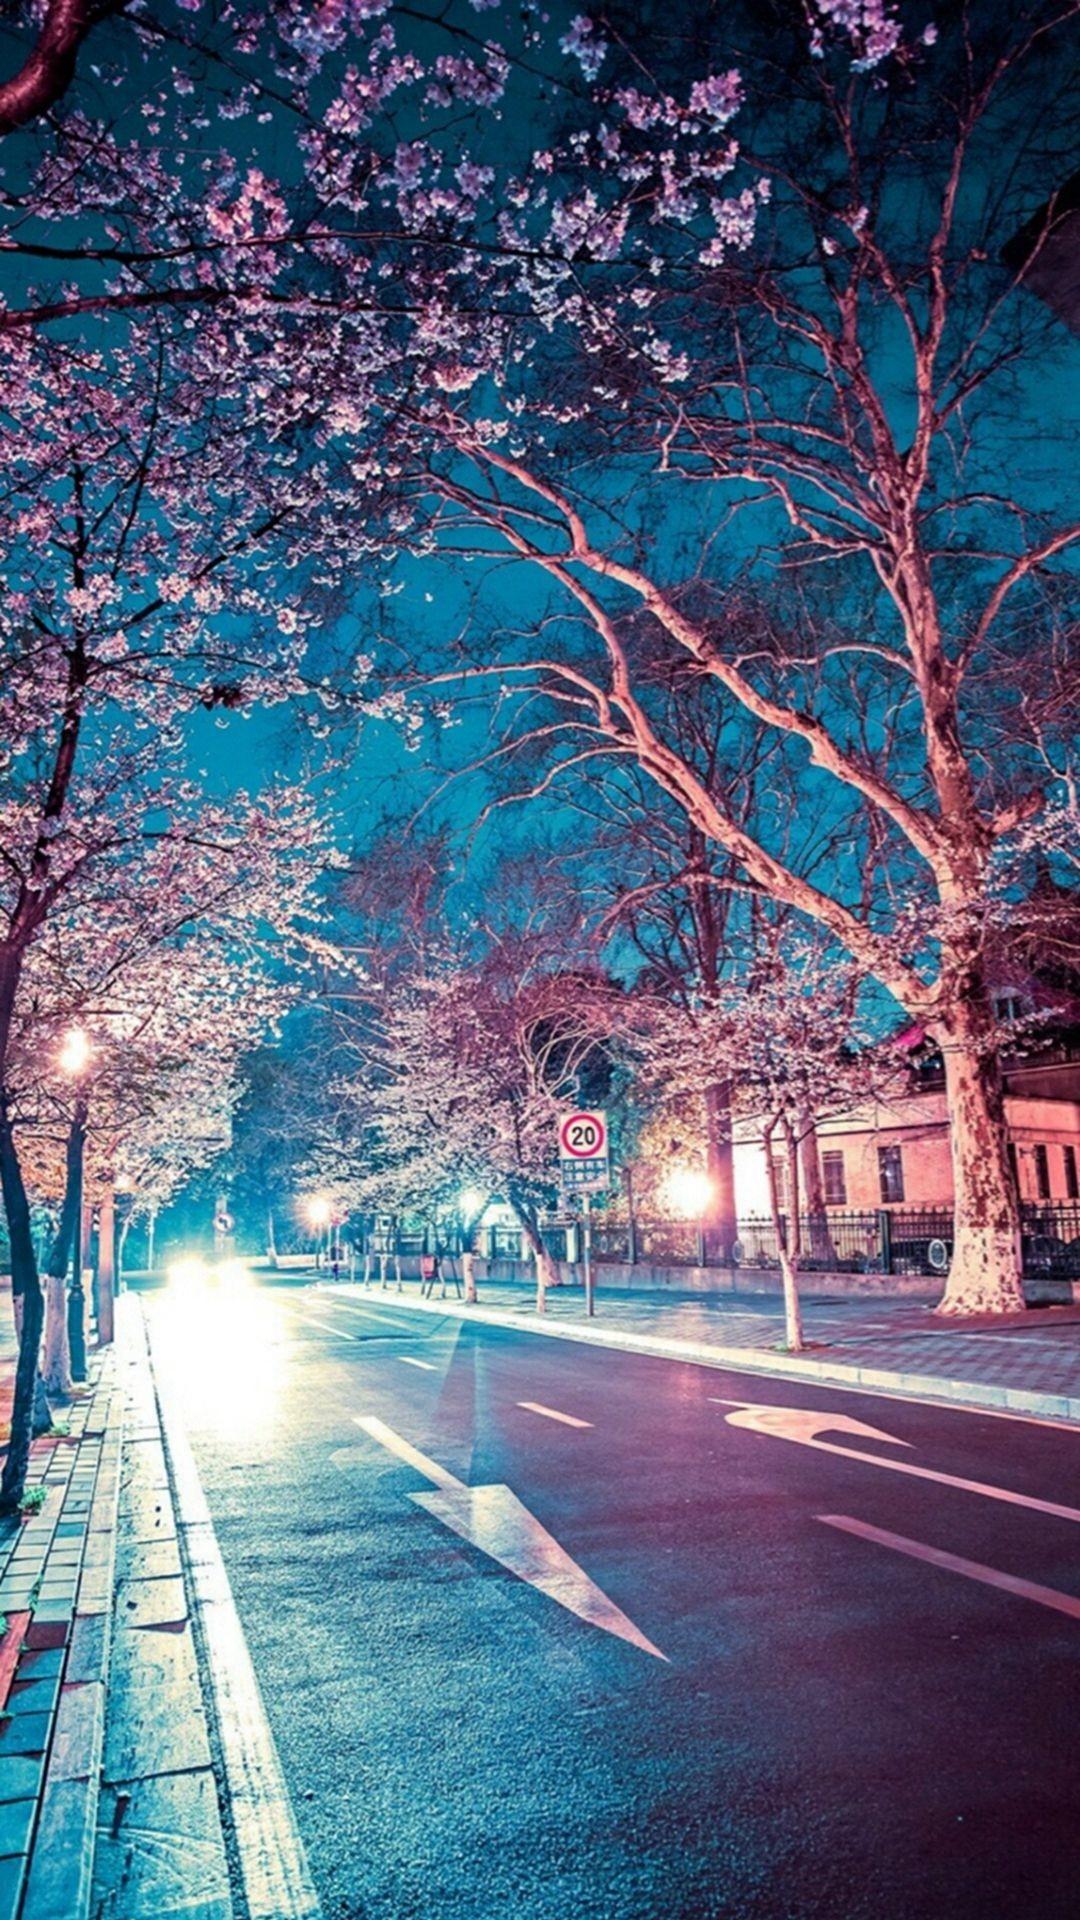 Res: 1080x1920, Japanese Street Cherry Blossom Night Scenery iPhone 6 wallpaper